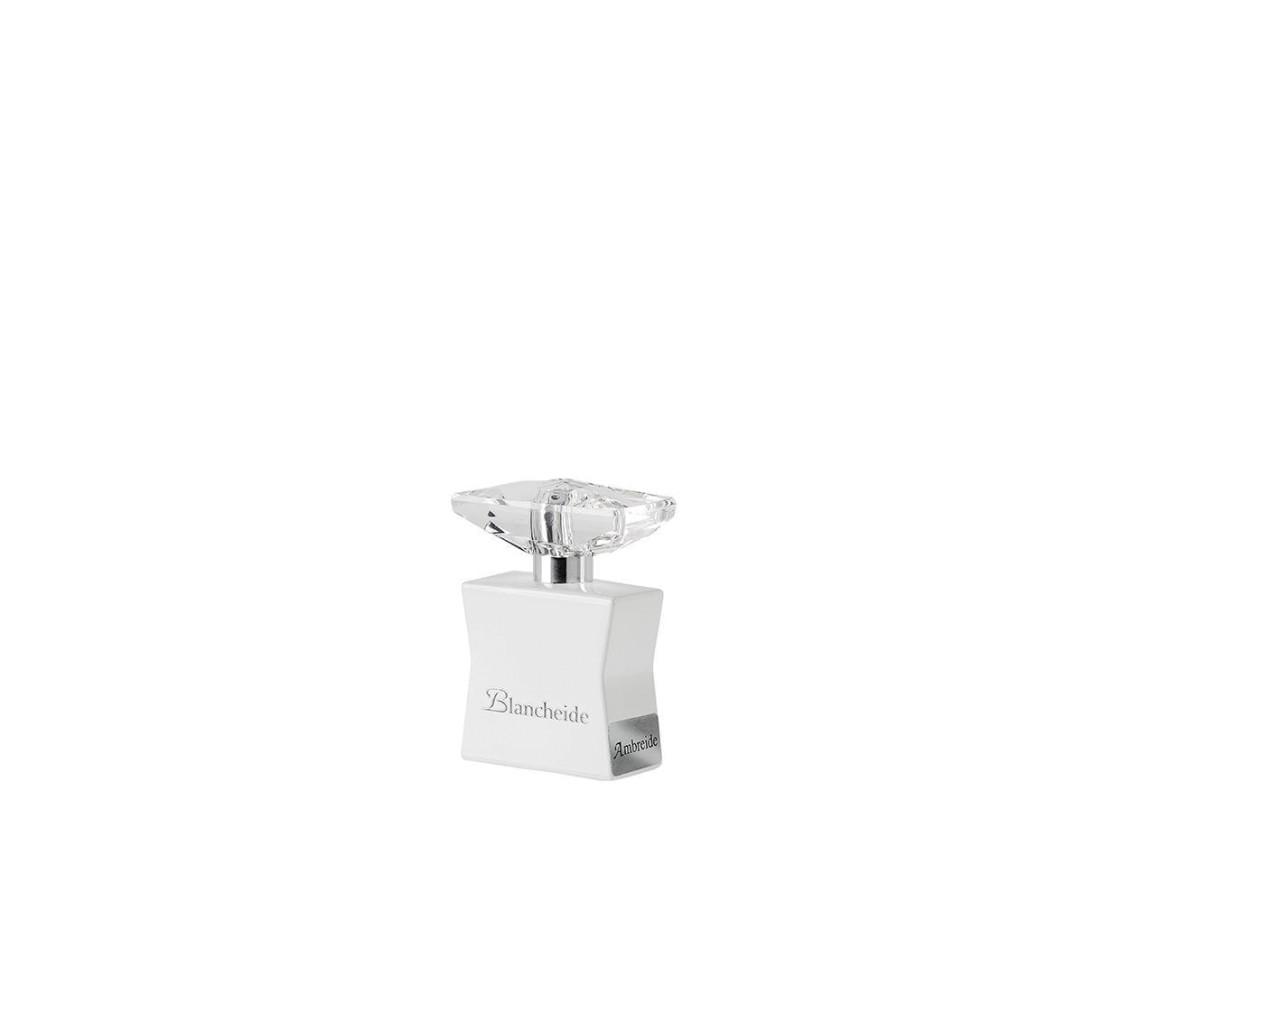 AMBREIDE BLANCHEIDE EDP 30 ML Blancheide BLAV30AM-01